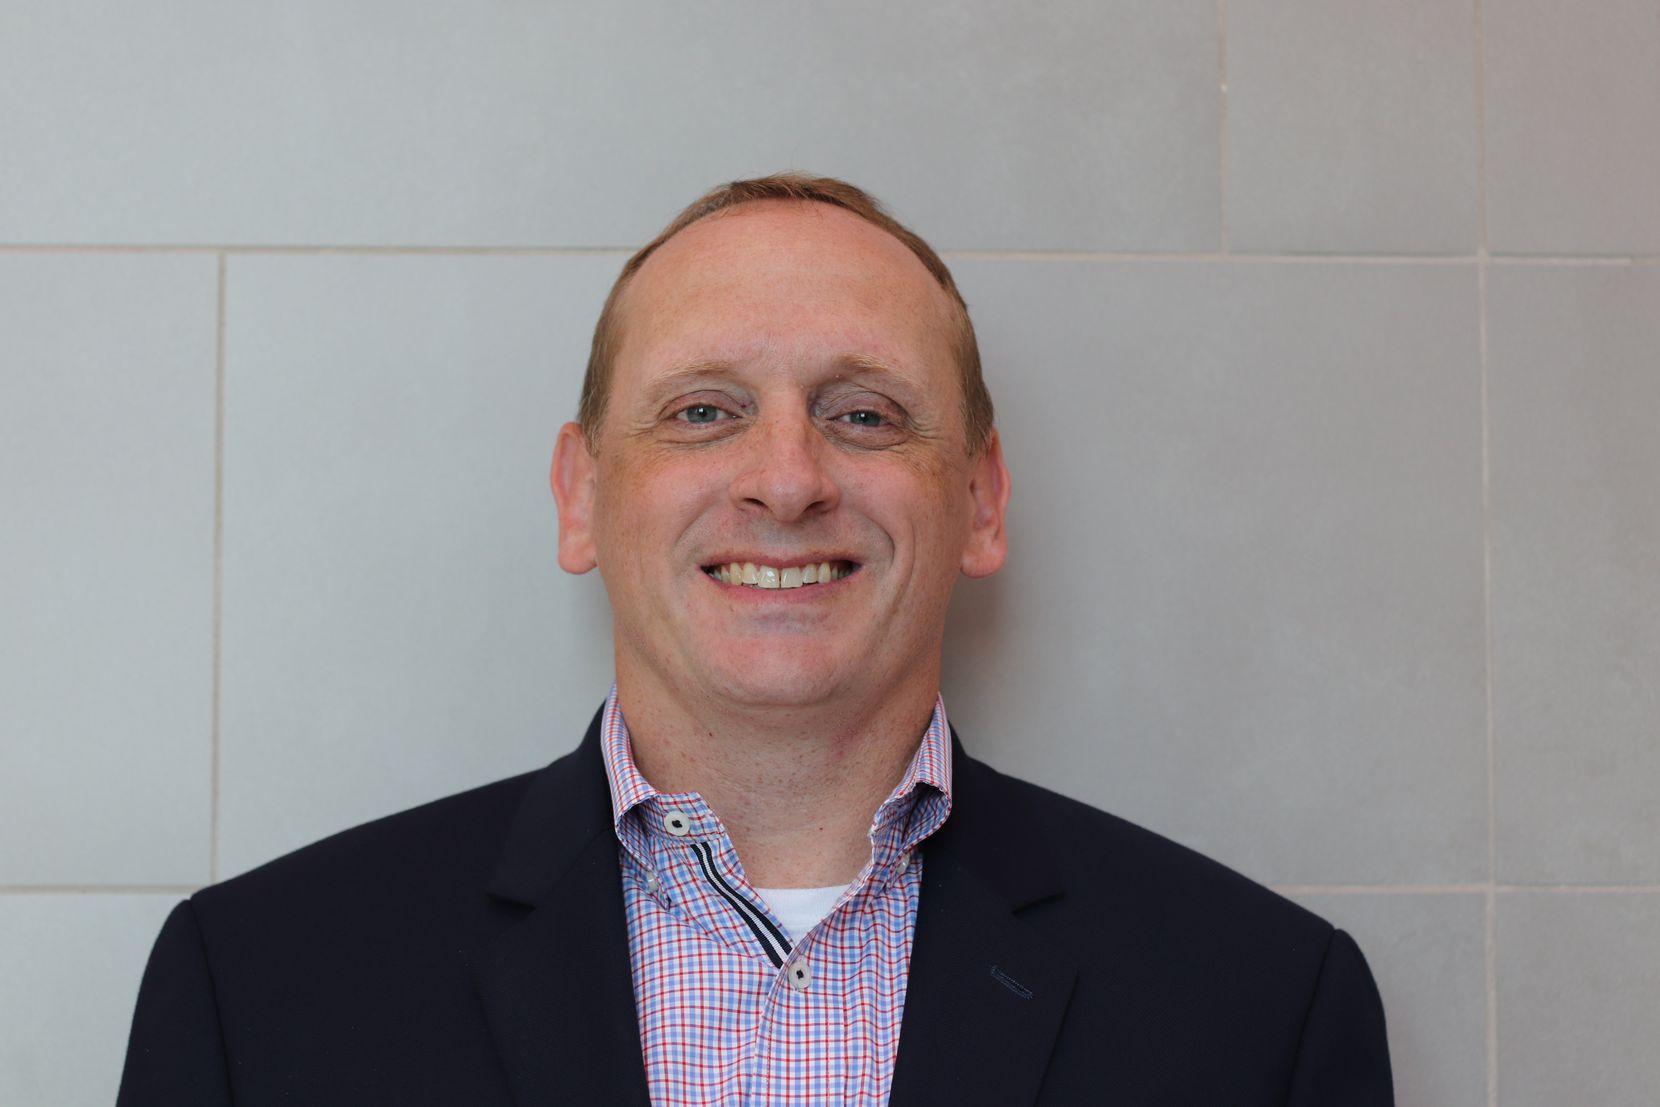 Reedy High School principal Jon-Eric Ziaer